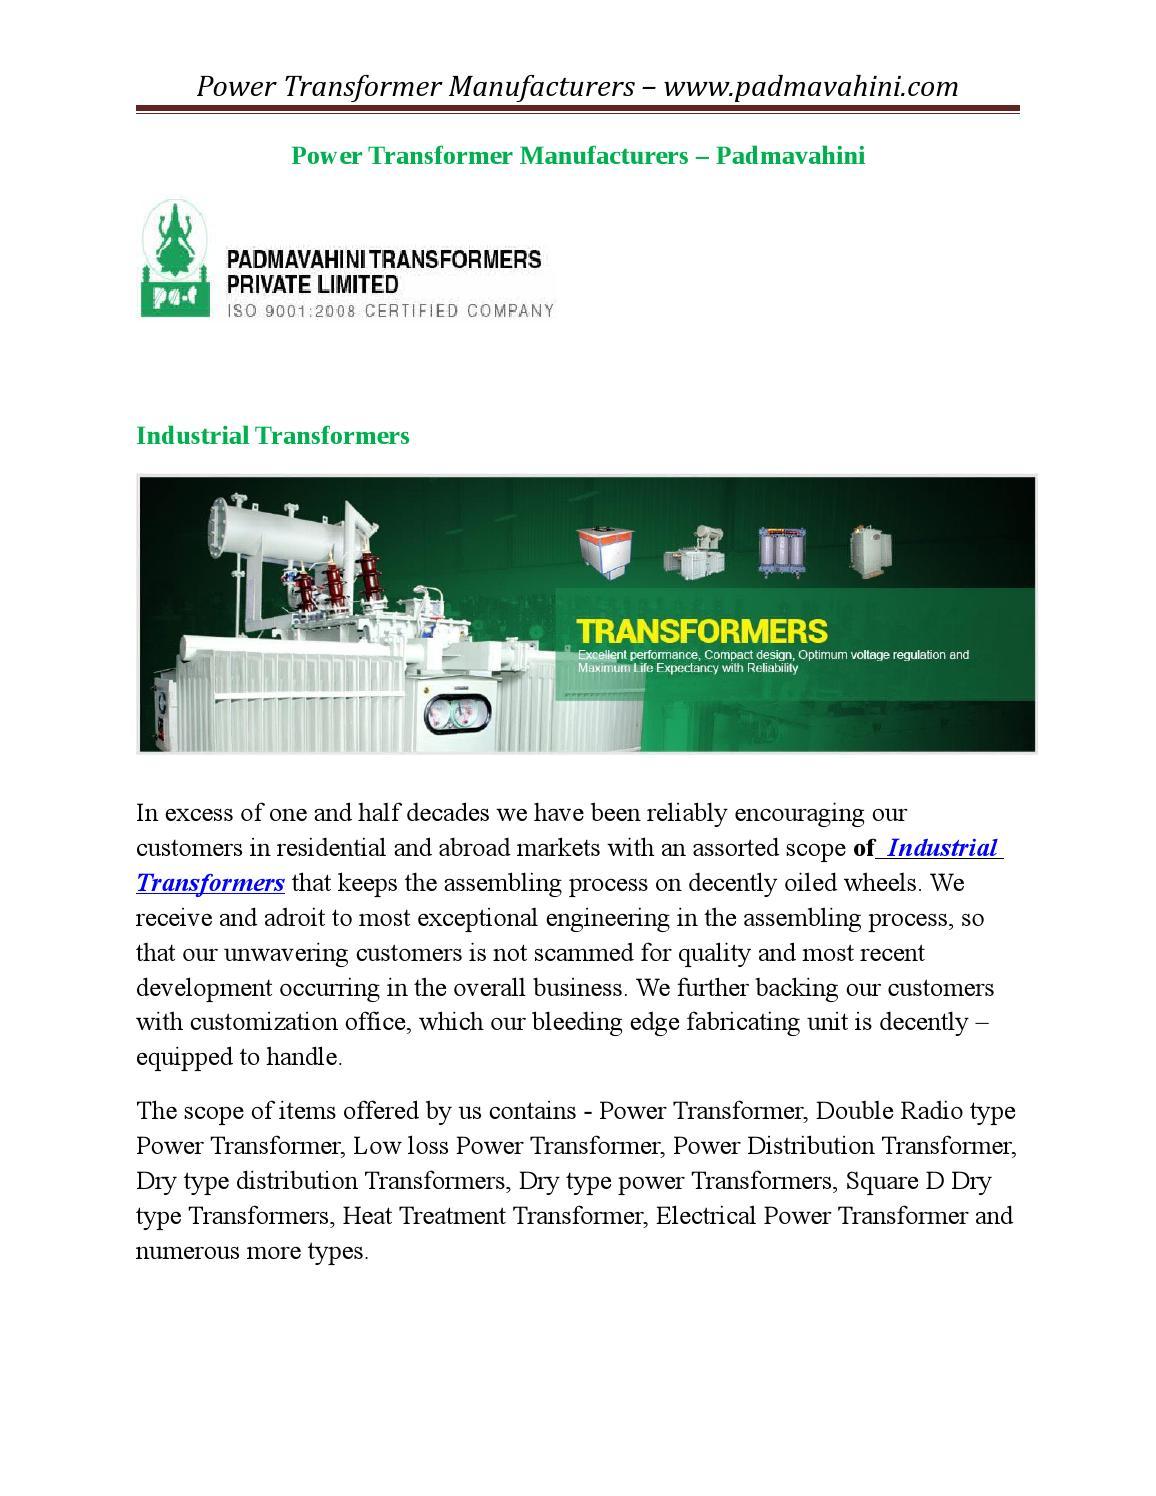 Power transformers manufacturers by Vathirajan transformer